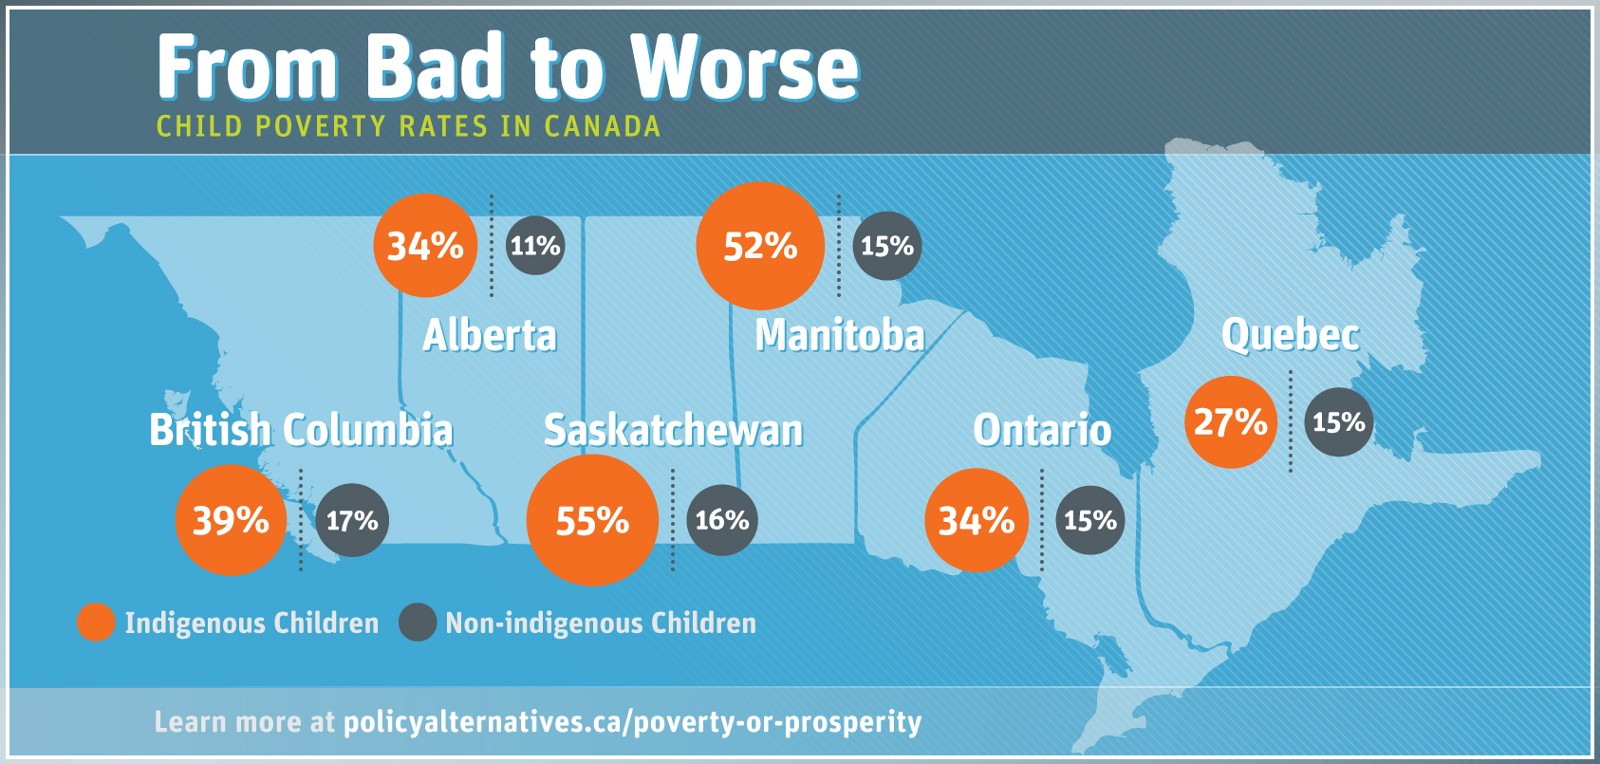 Photo credit: policyalternatives.ca